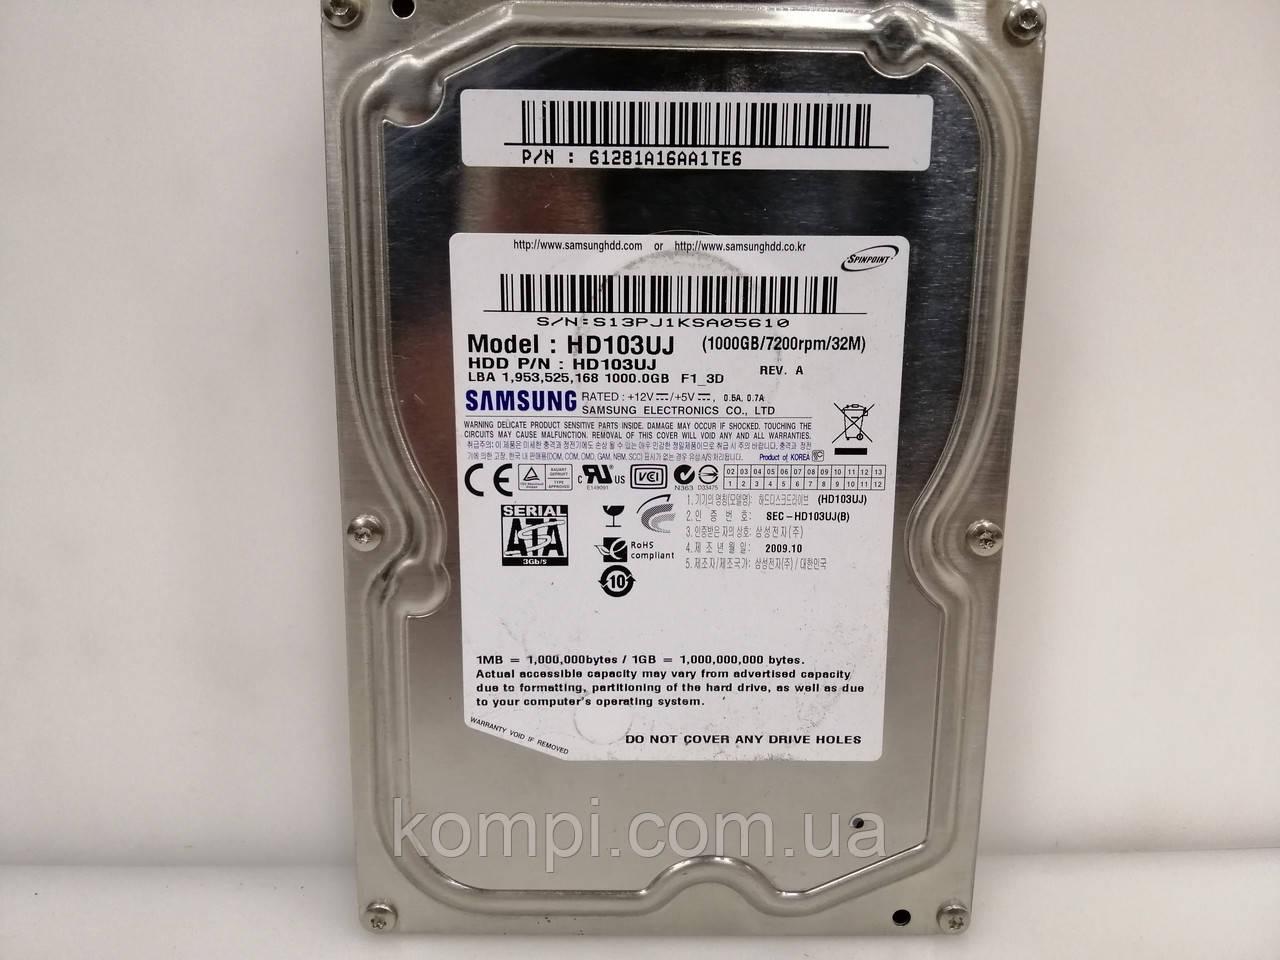 HDD Жорсткий диск Samsung Spinpoint F1 1TB 7200rpm 32MB 3.5 SATA II  для ПК ІДЕАЛЬНИЙ СТАН